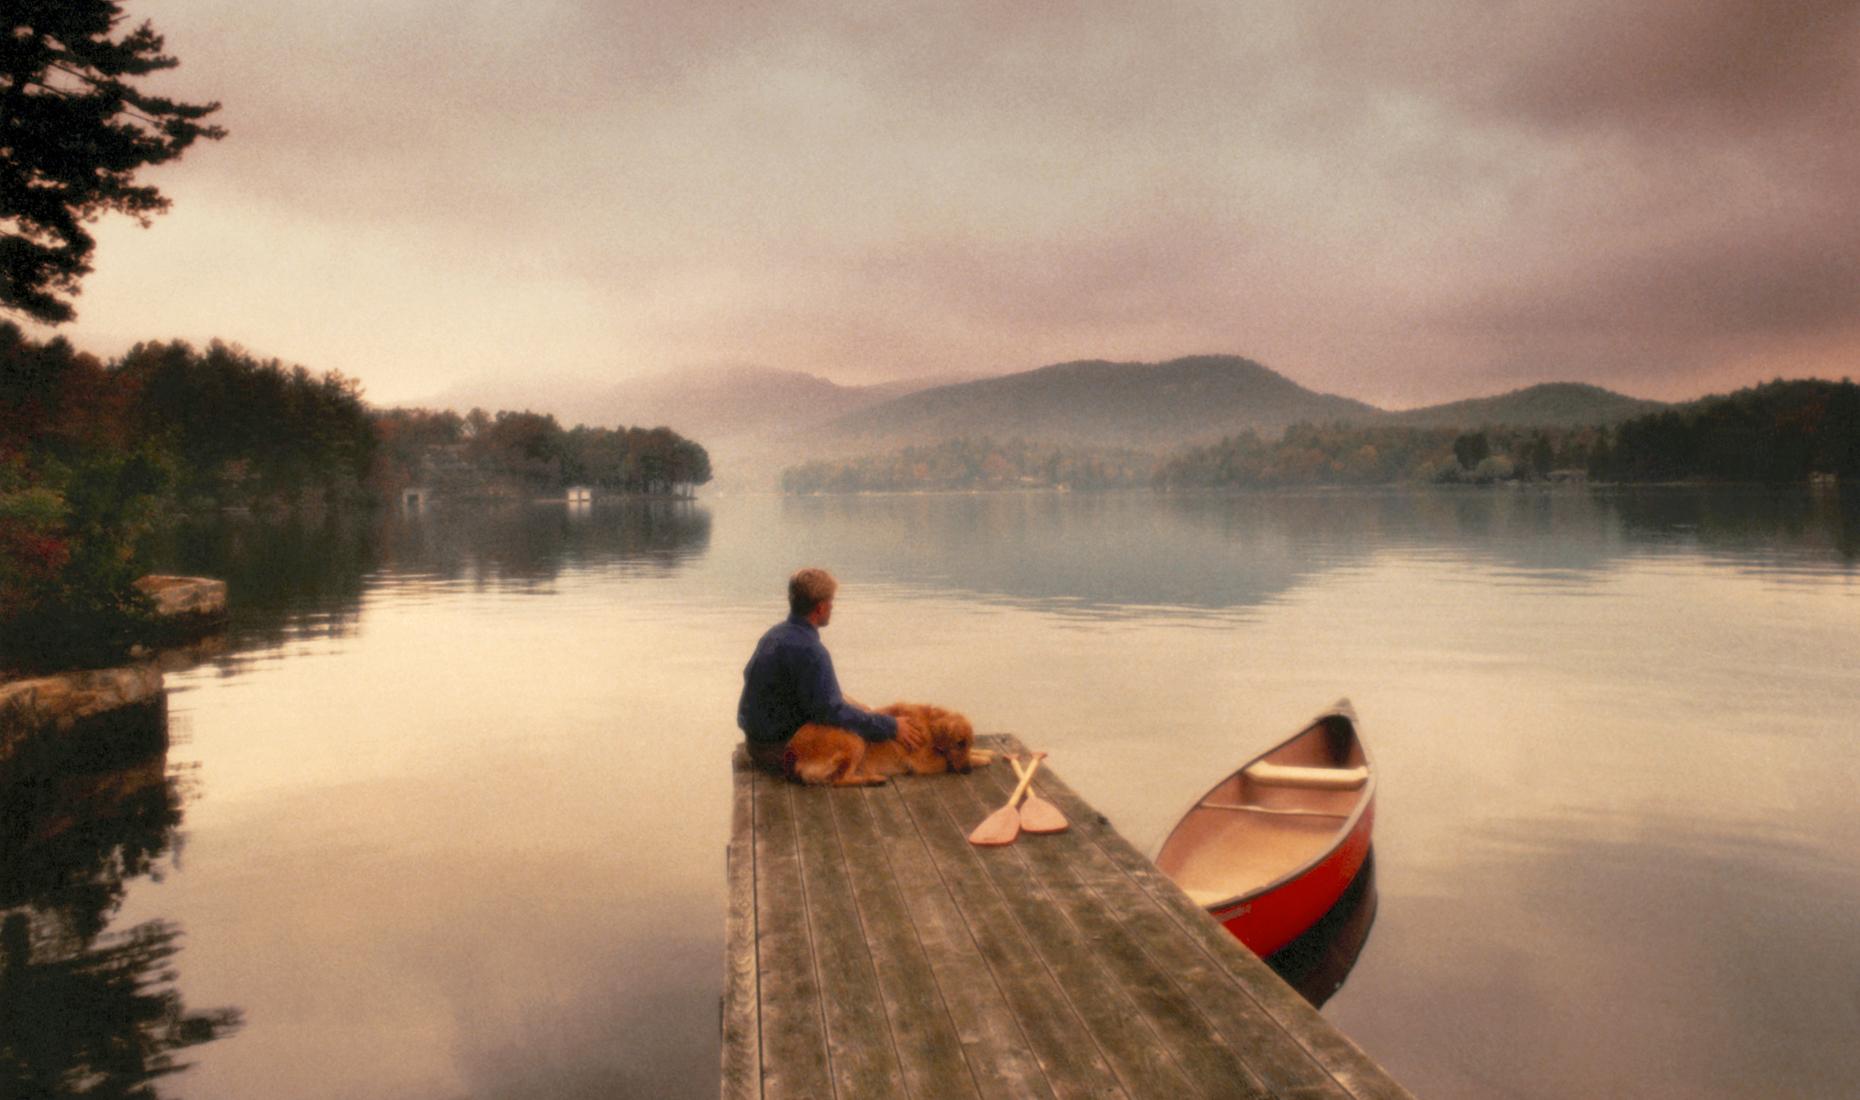 Canoe+docked+Web.jpg